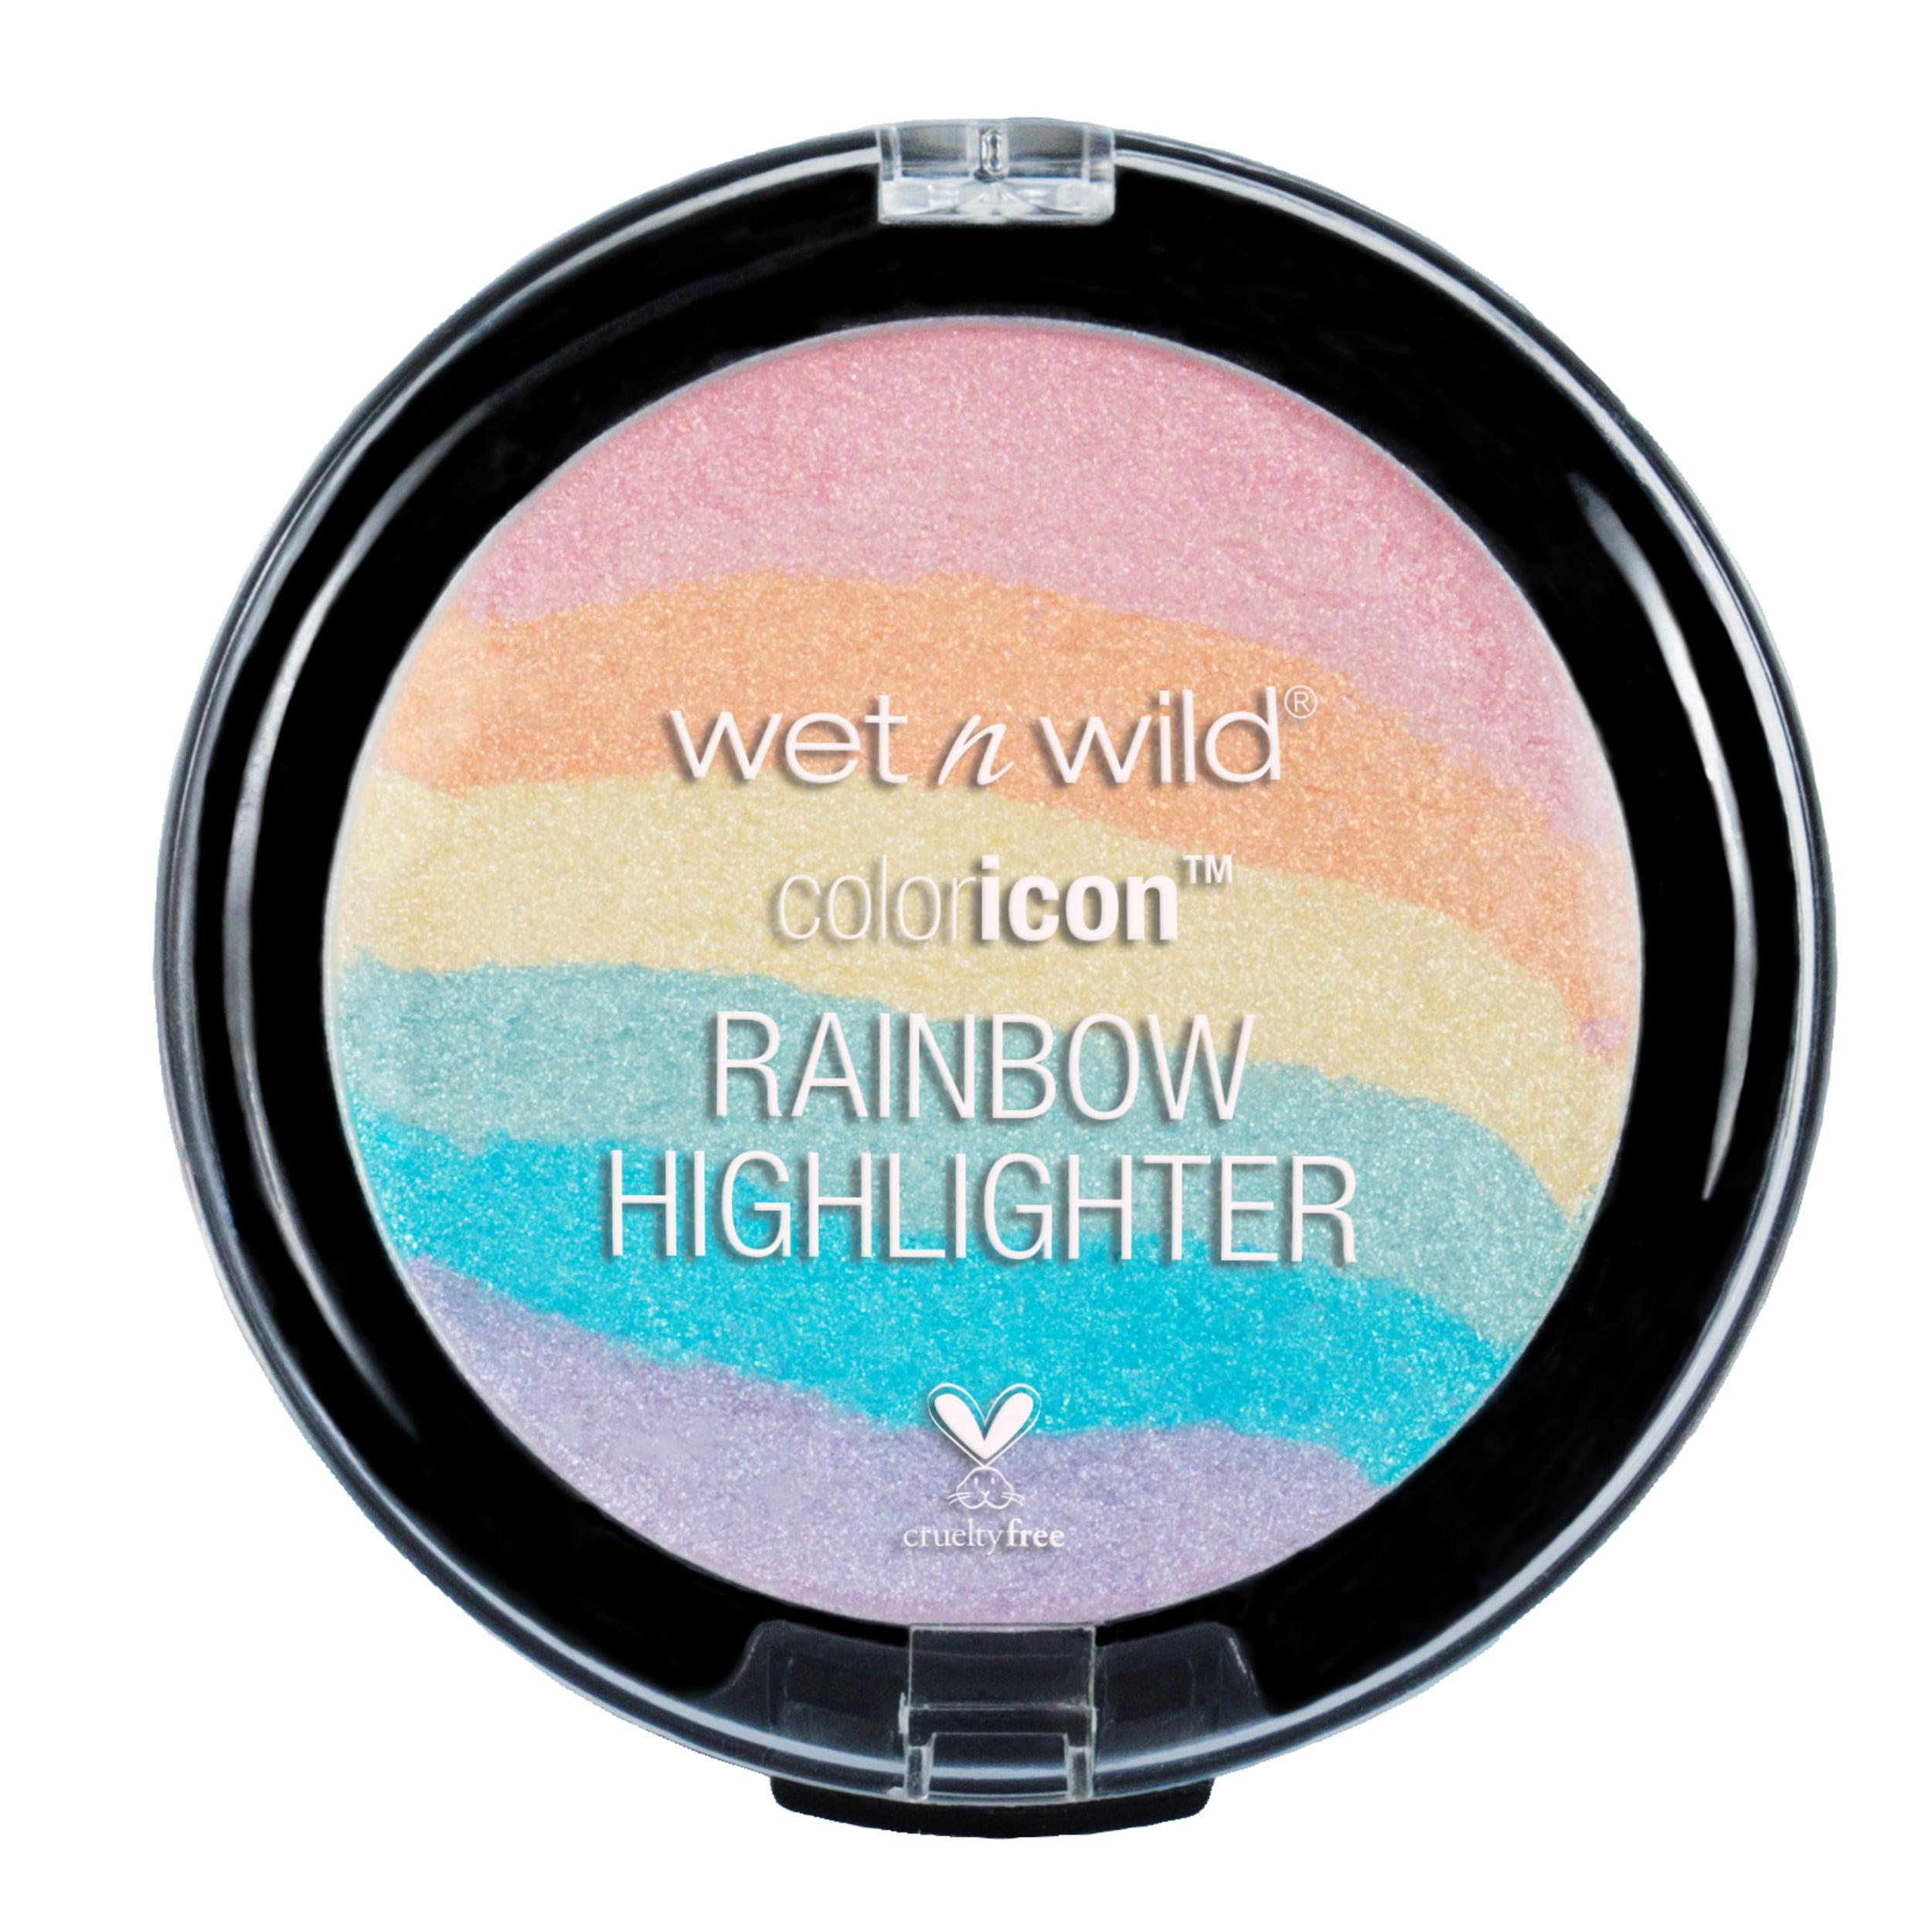 wet n wild Color Icon Rainbow Highlighter, Unicorn Glow